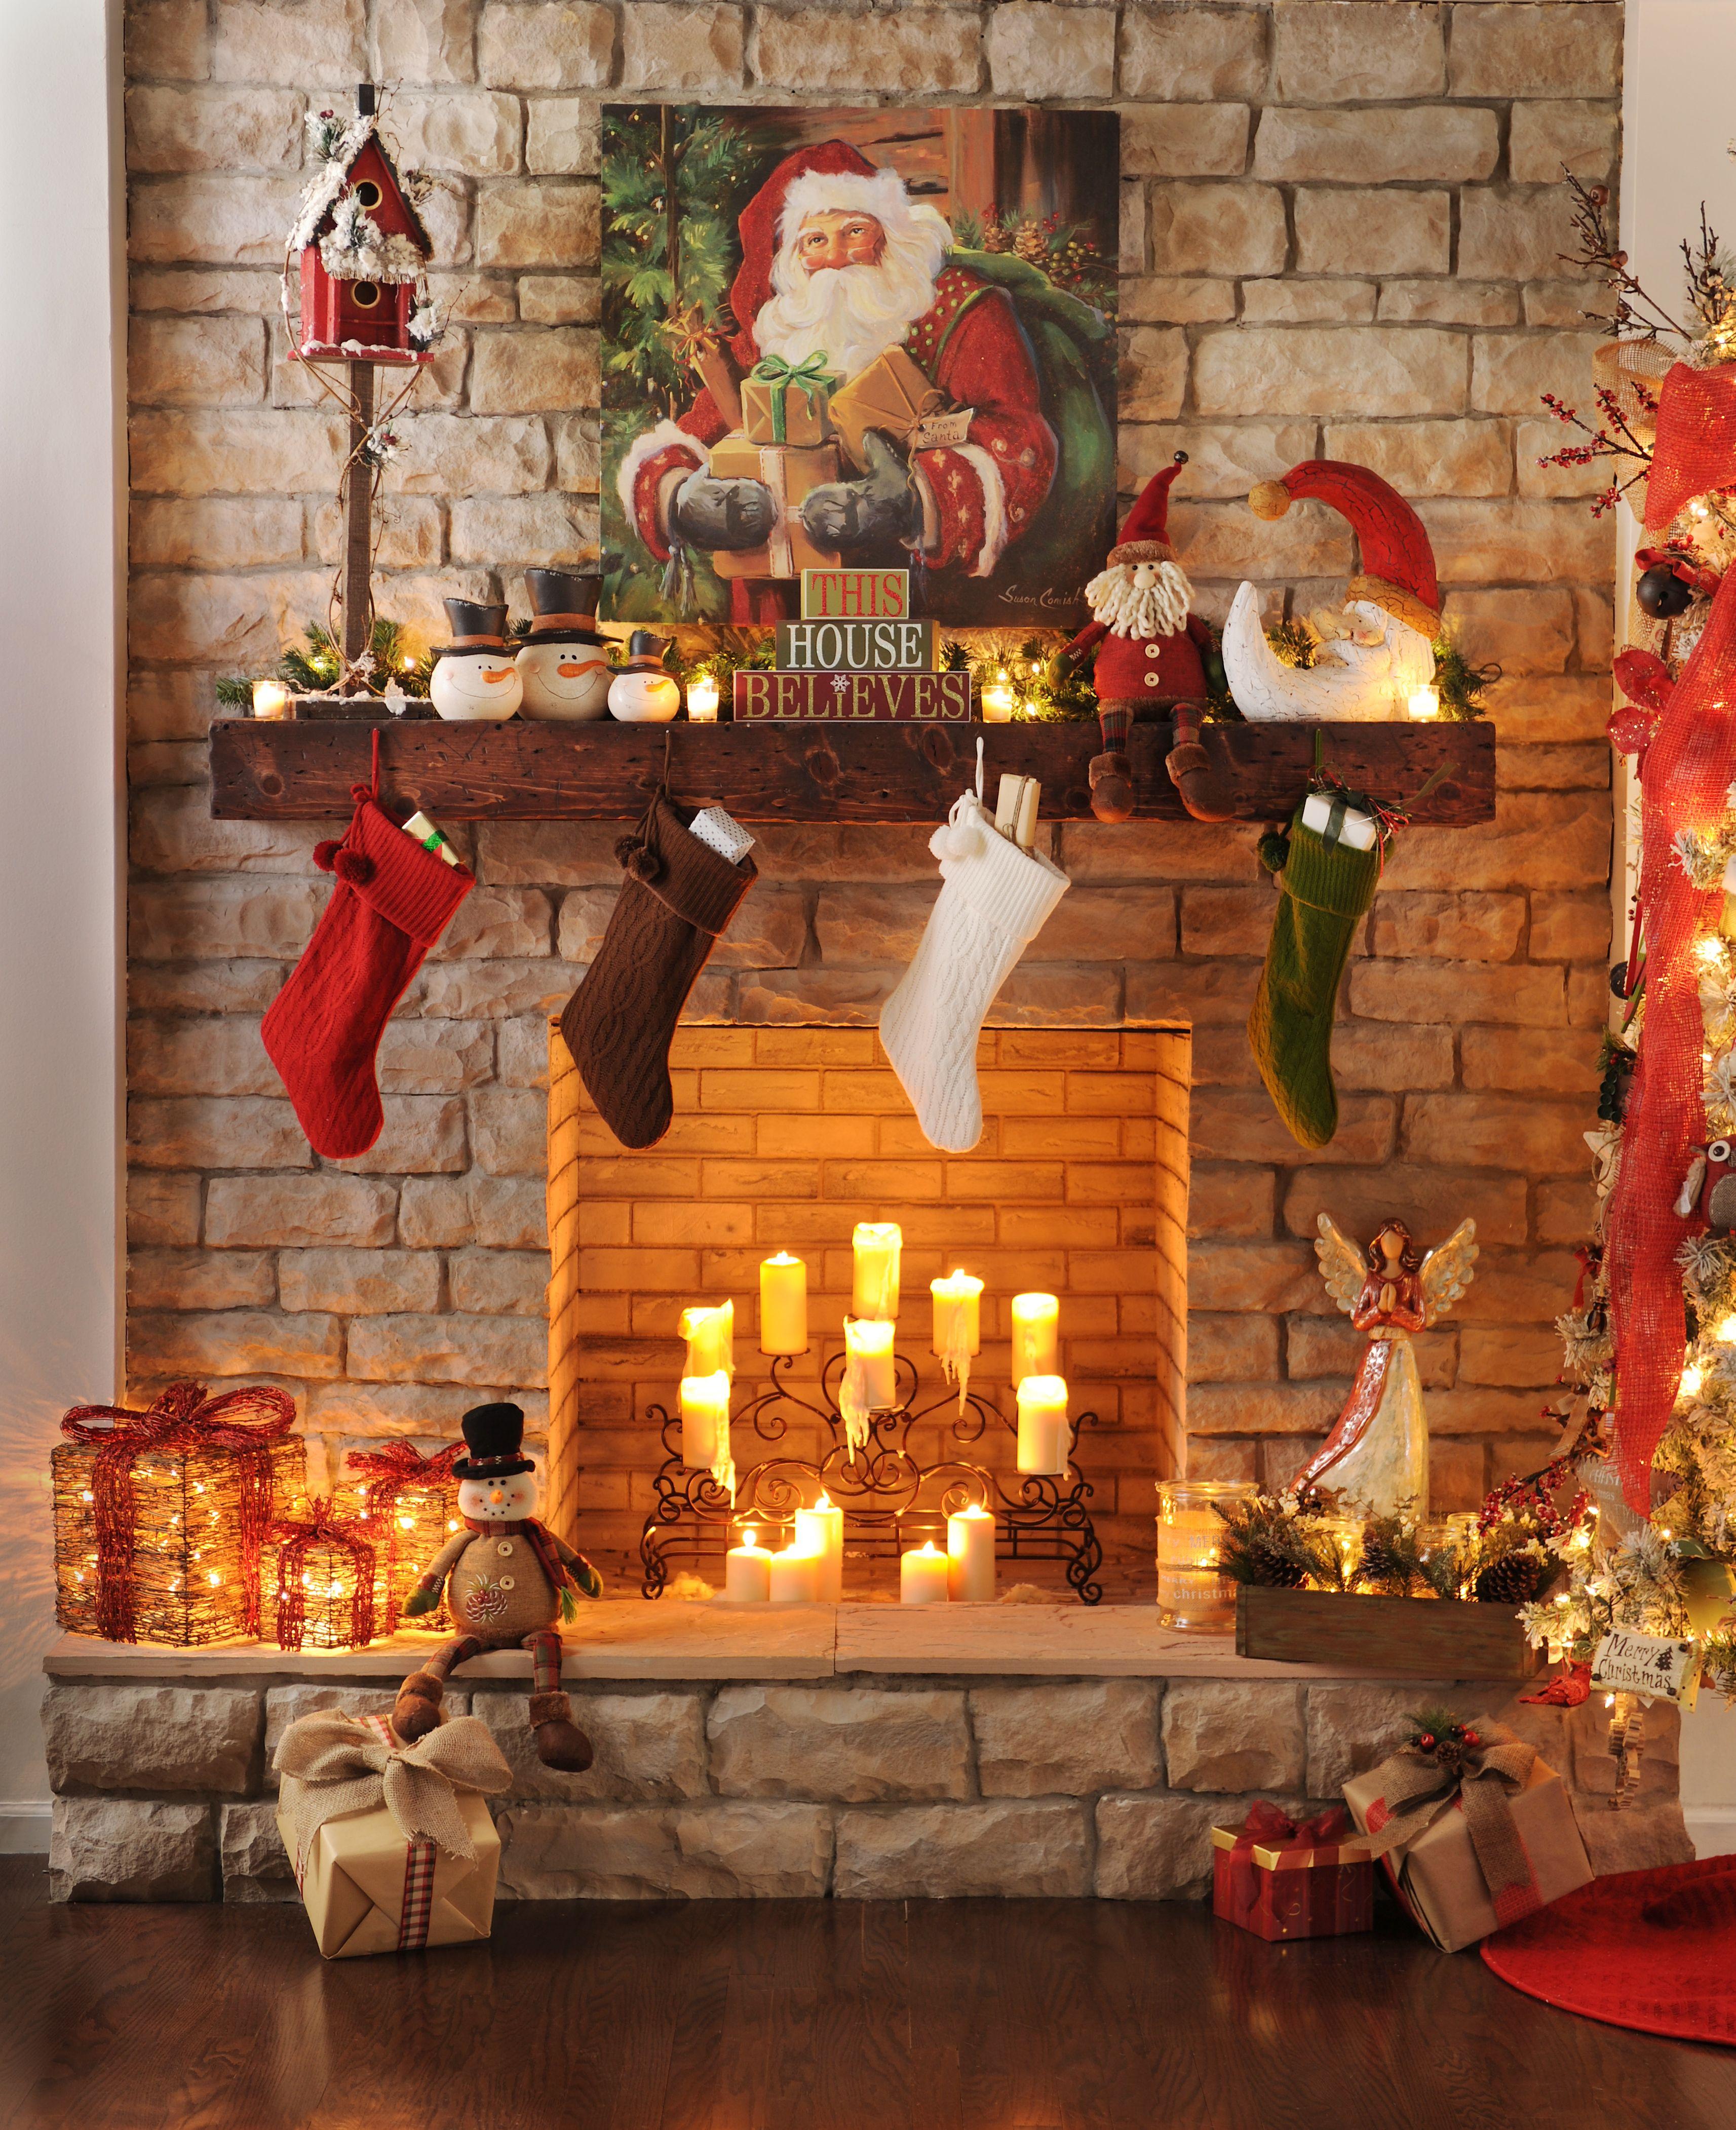 How to Create a Festive Holiday-Ready Home | Christmas decor ...